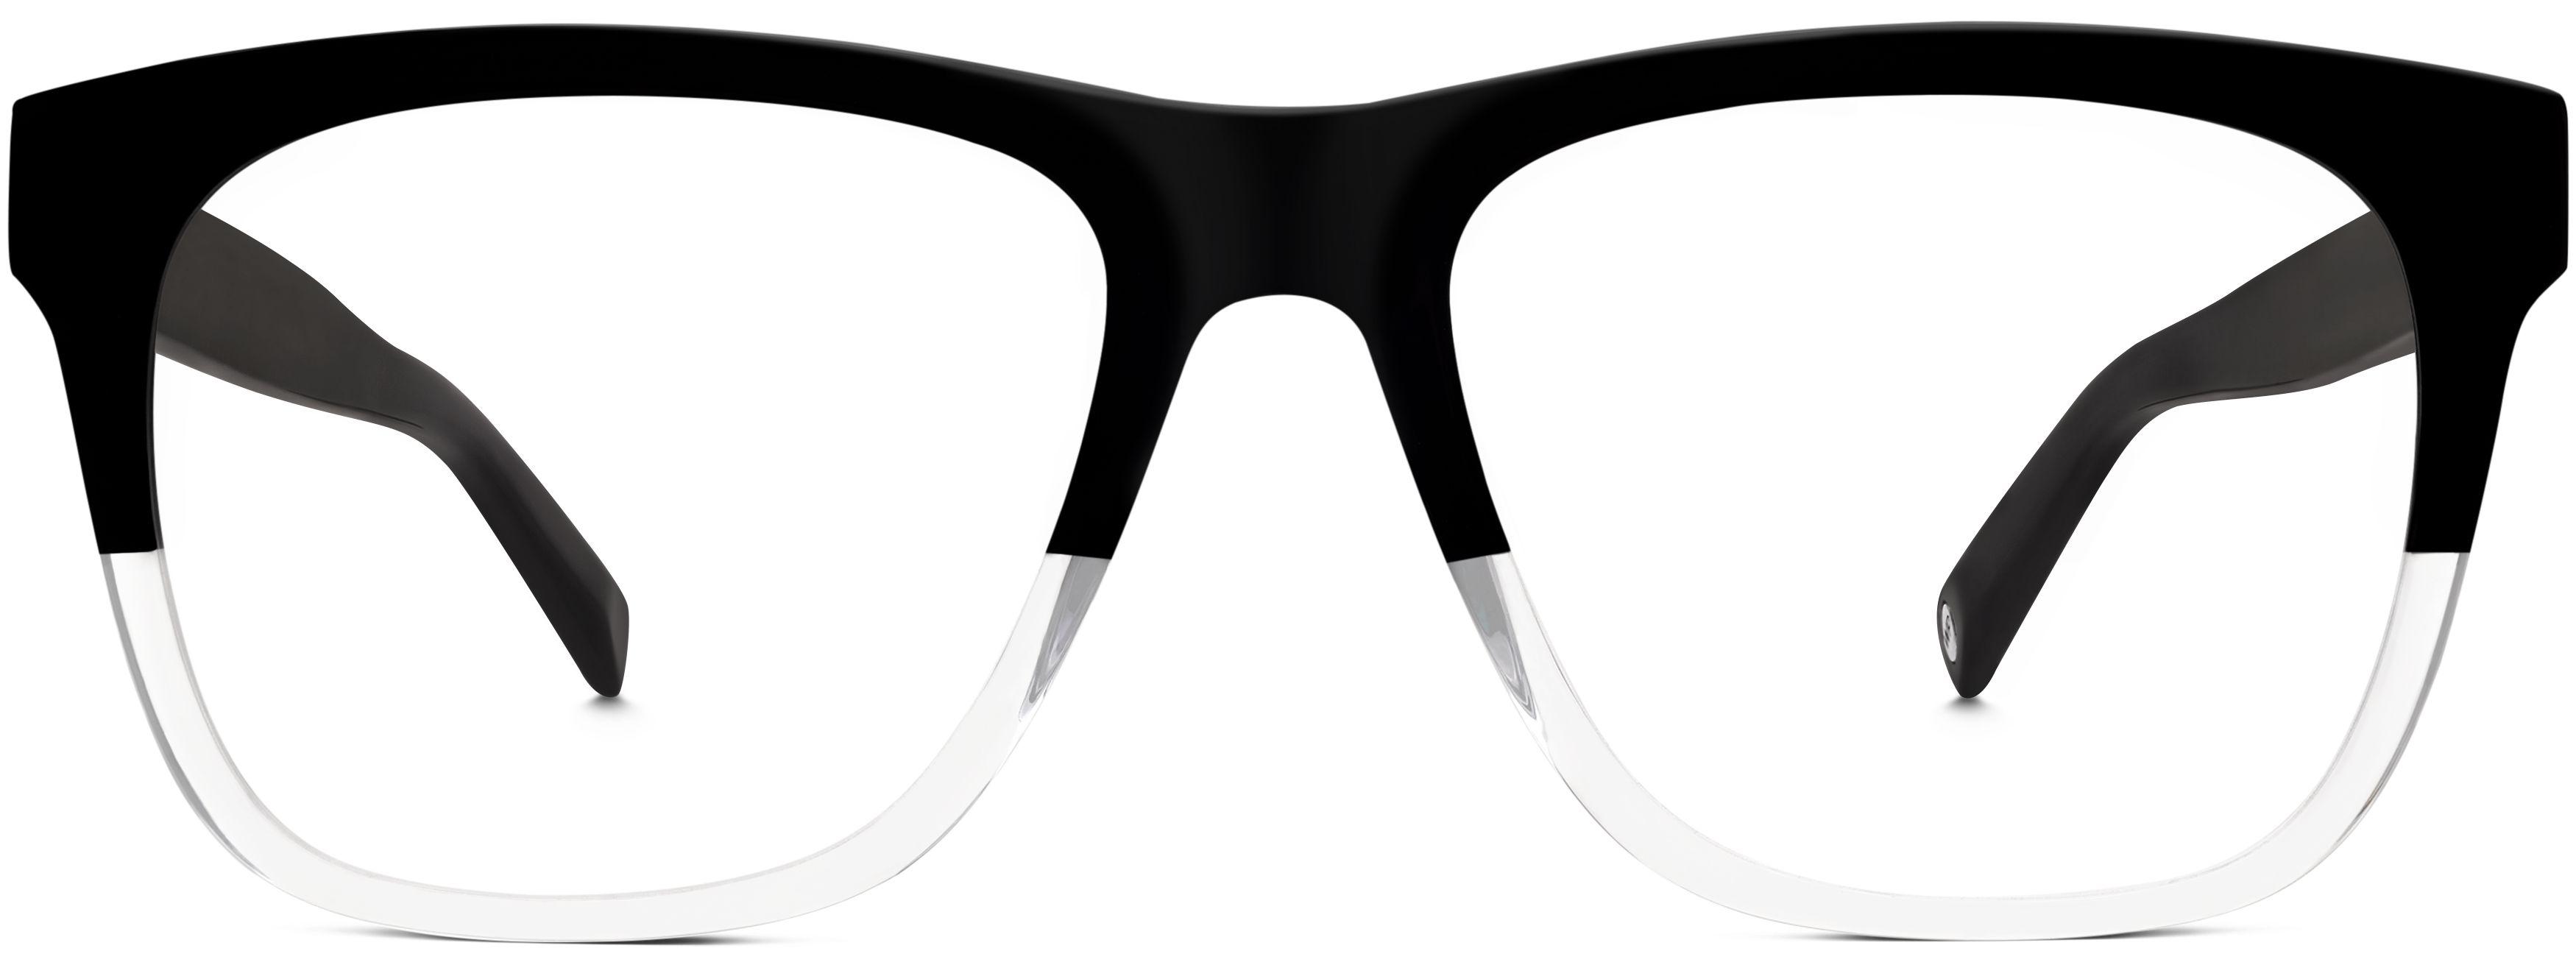 d5a131630ca4 Lowry Eyeglasses in Jet Black Fade for Women